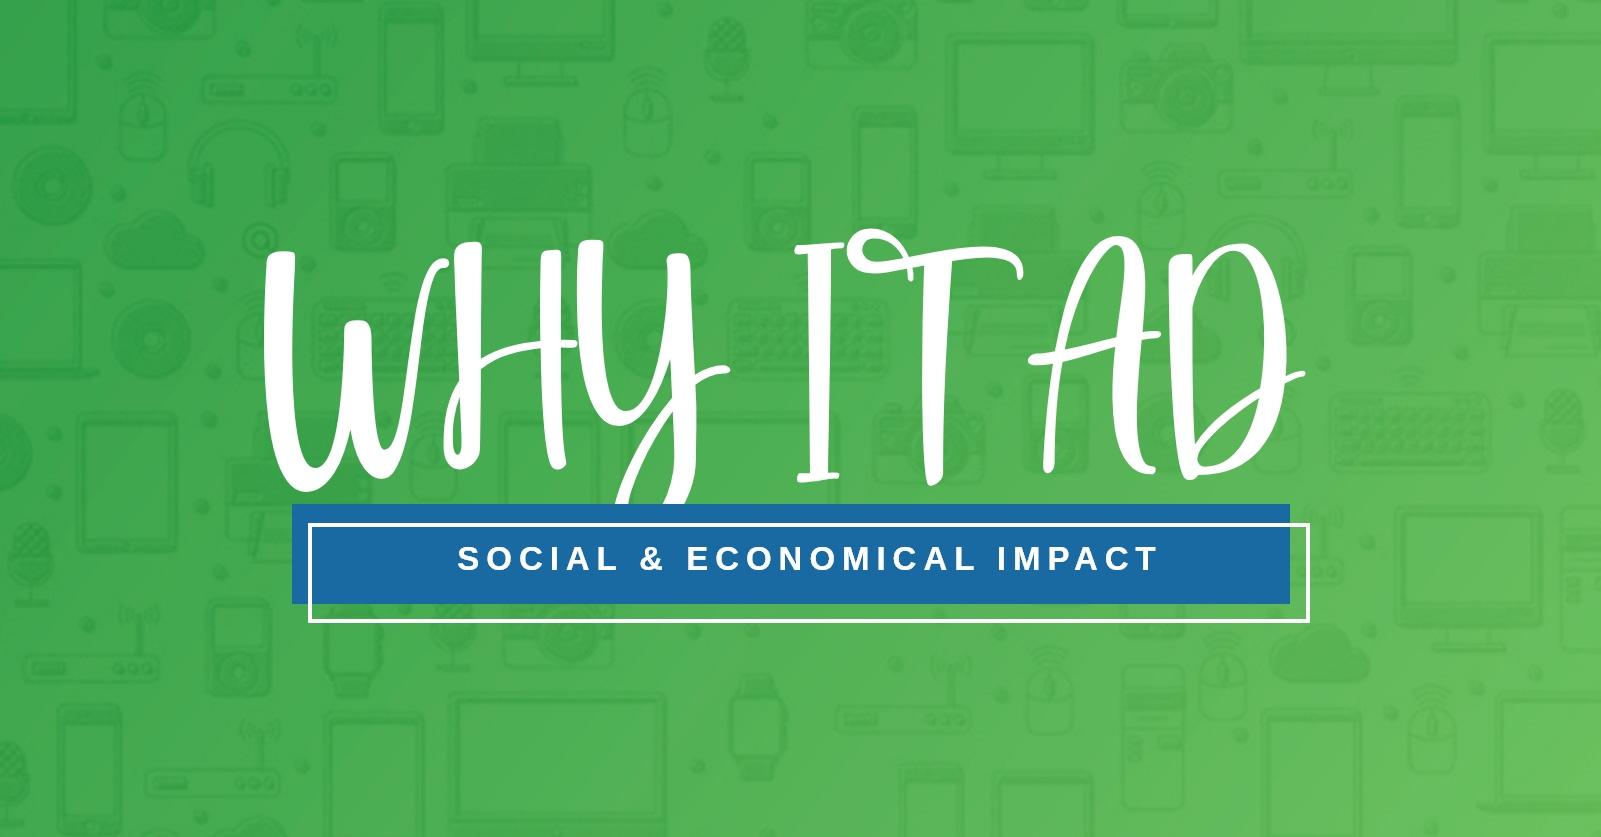 The social & economic impact of ITAD